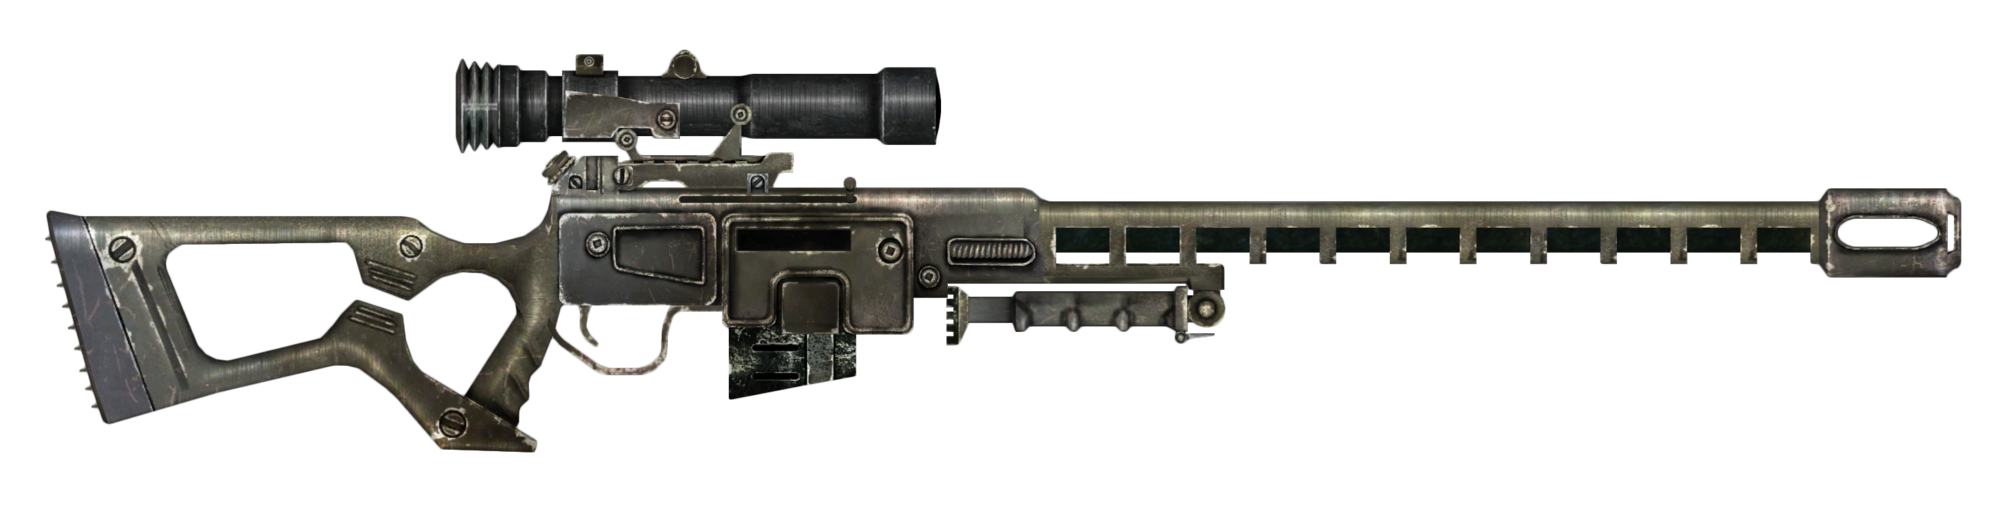 2000?cb=20110206233717 sniper rifle (fallout new vegas) fallout wiki fandom powered fallout new vegas electric box fuse code at virtualis.co